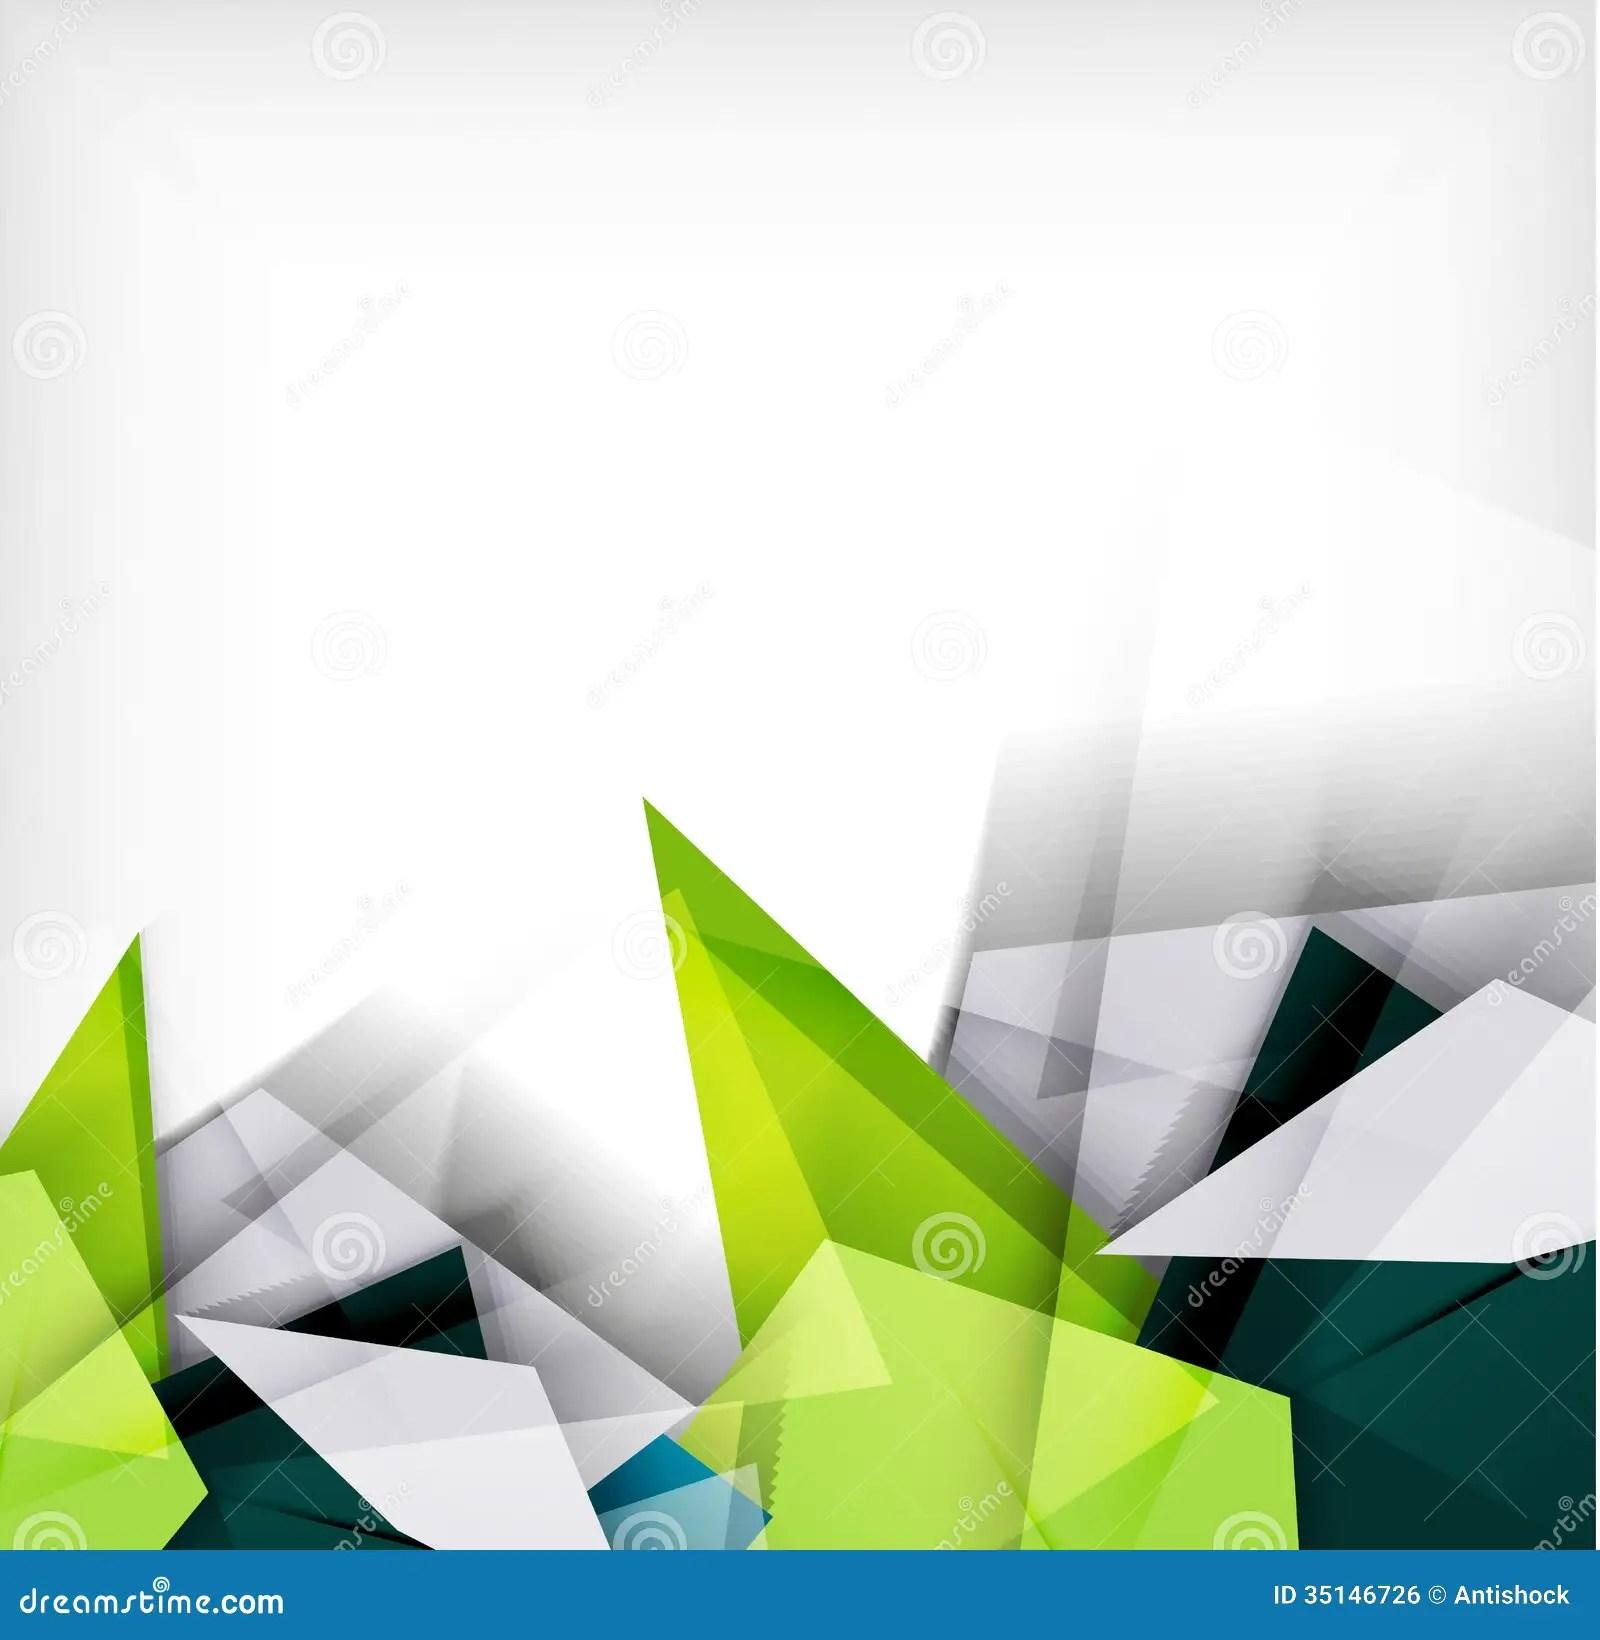 Diamond Wallpaper Hd Abstract Geometric Shape Background Royalty Free Stock